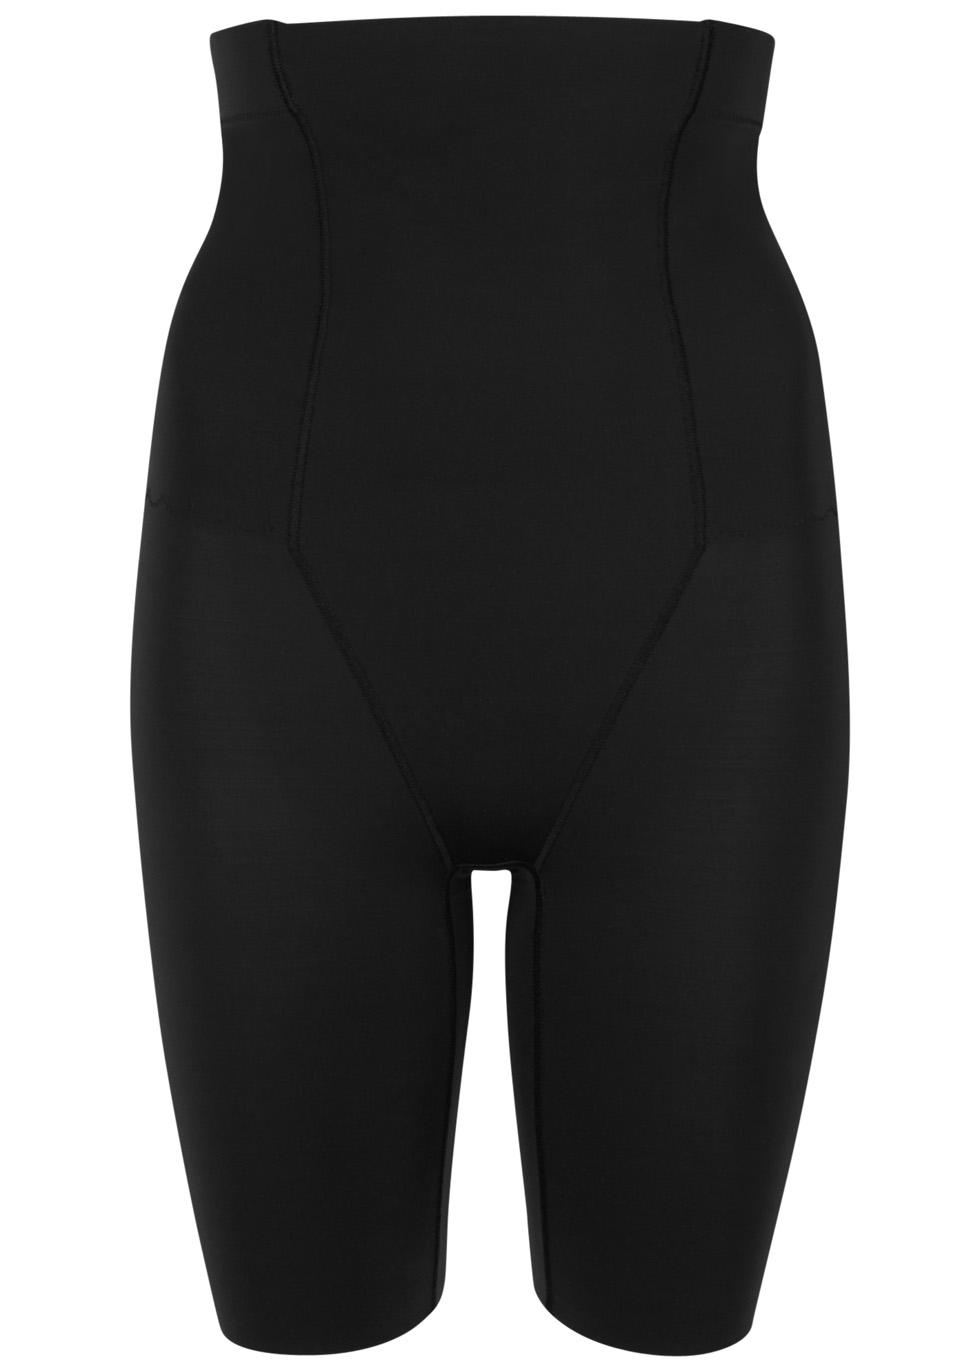 Beauty Secret control shorts